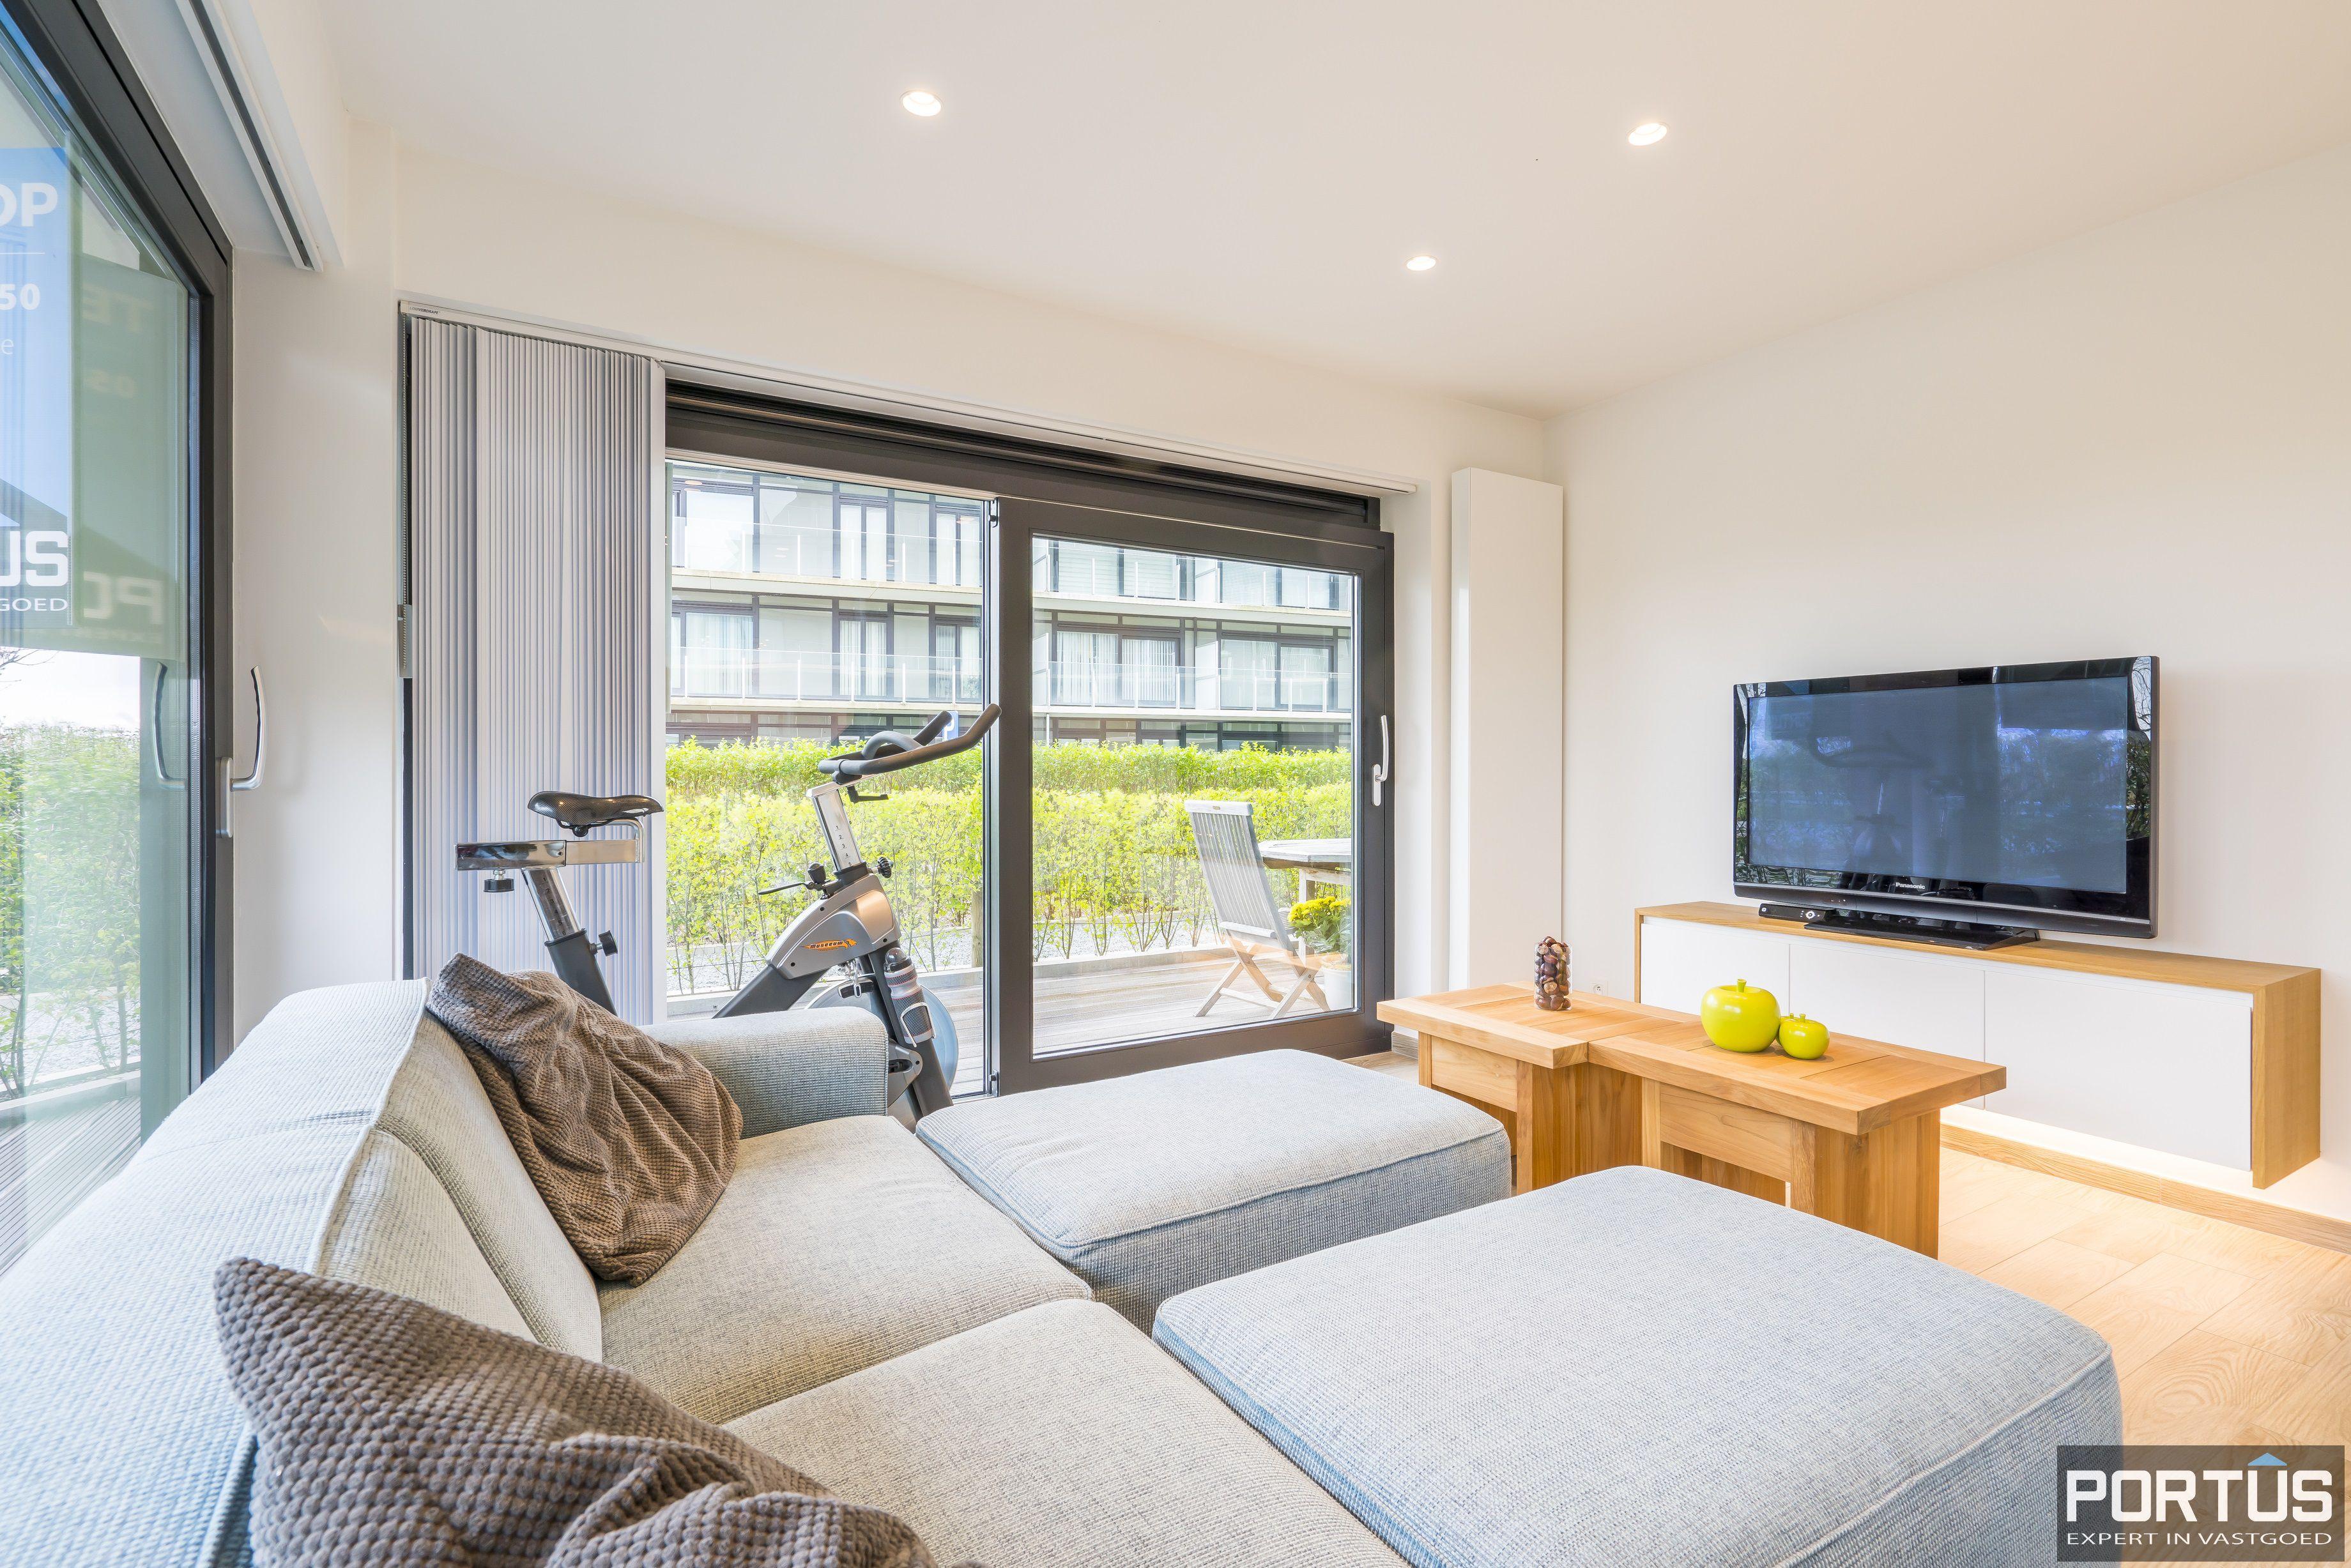 Appartement te koop met 2 slaapkamers in Residentie Waterfront te Nieuwpoort - 11880